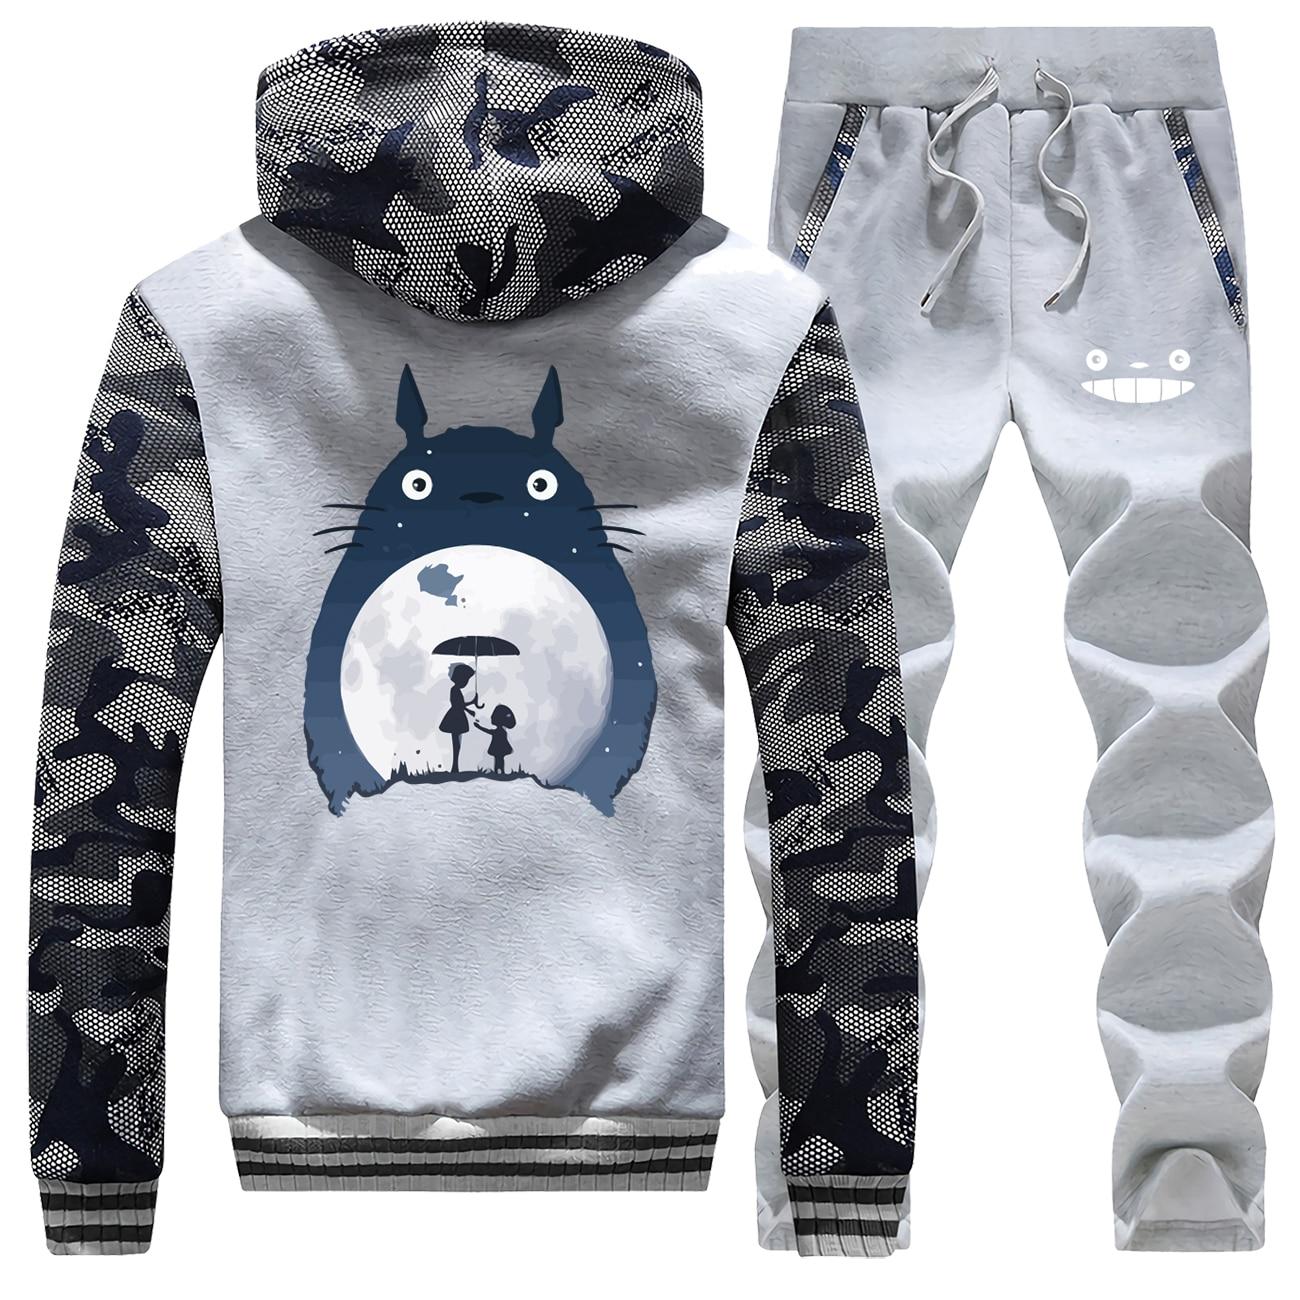 Japan Anime Camo Men Sets Tonari No Totoro Hoodies Pants Full Suit Tracksuit Thick Fleece Pants Sweatshirts Winter Set Sweatsuit